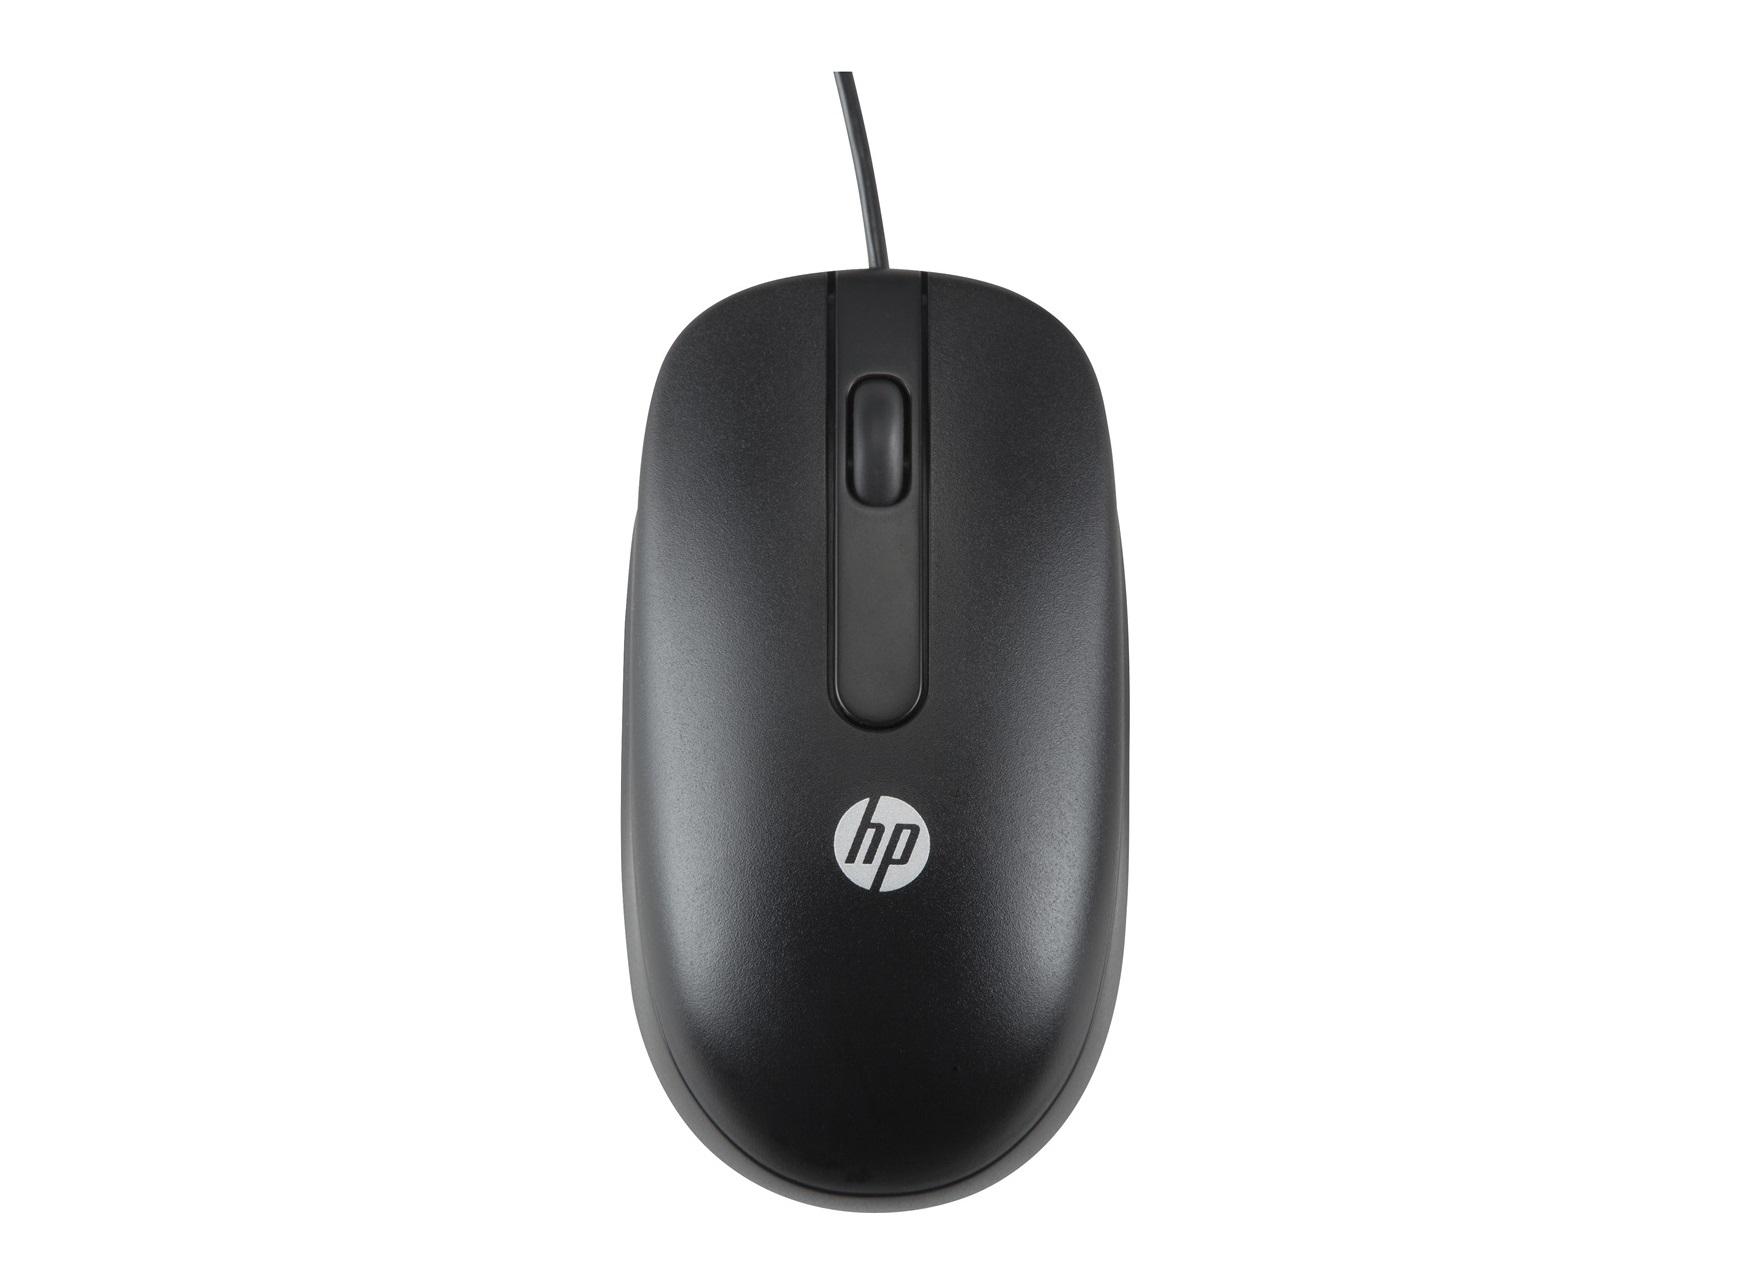 HP USB laser light optical mouse 1000 DPI Ambidextrous